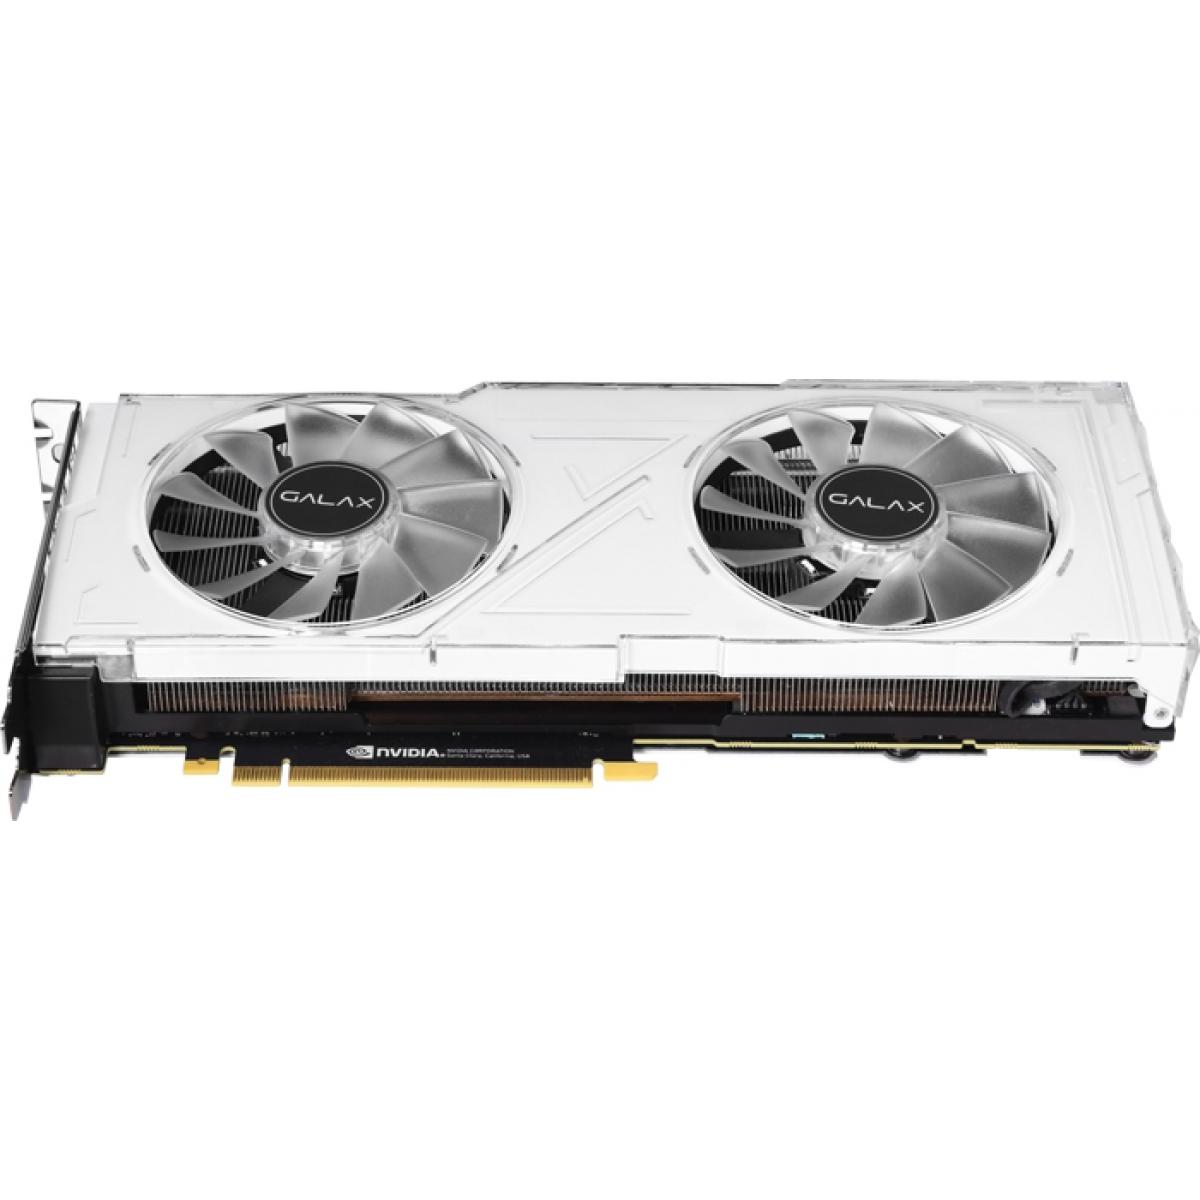 Placa de Vídeo Galax Geforce RTX 2080 Ti White (1-Click OC) Dual, 11GB GDDR6, 352Bit